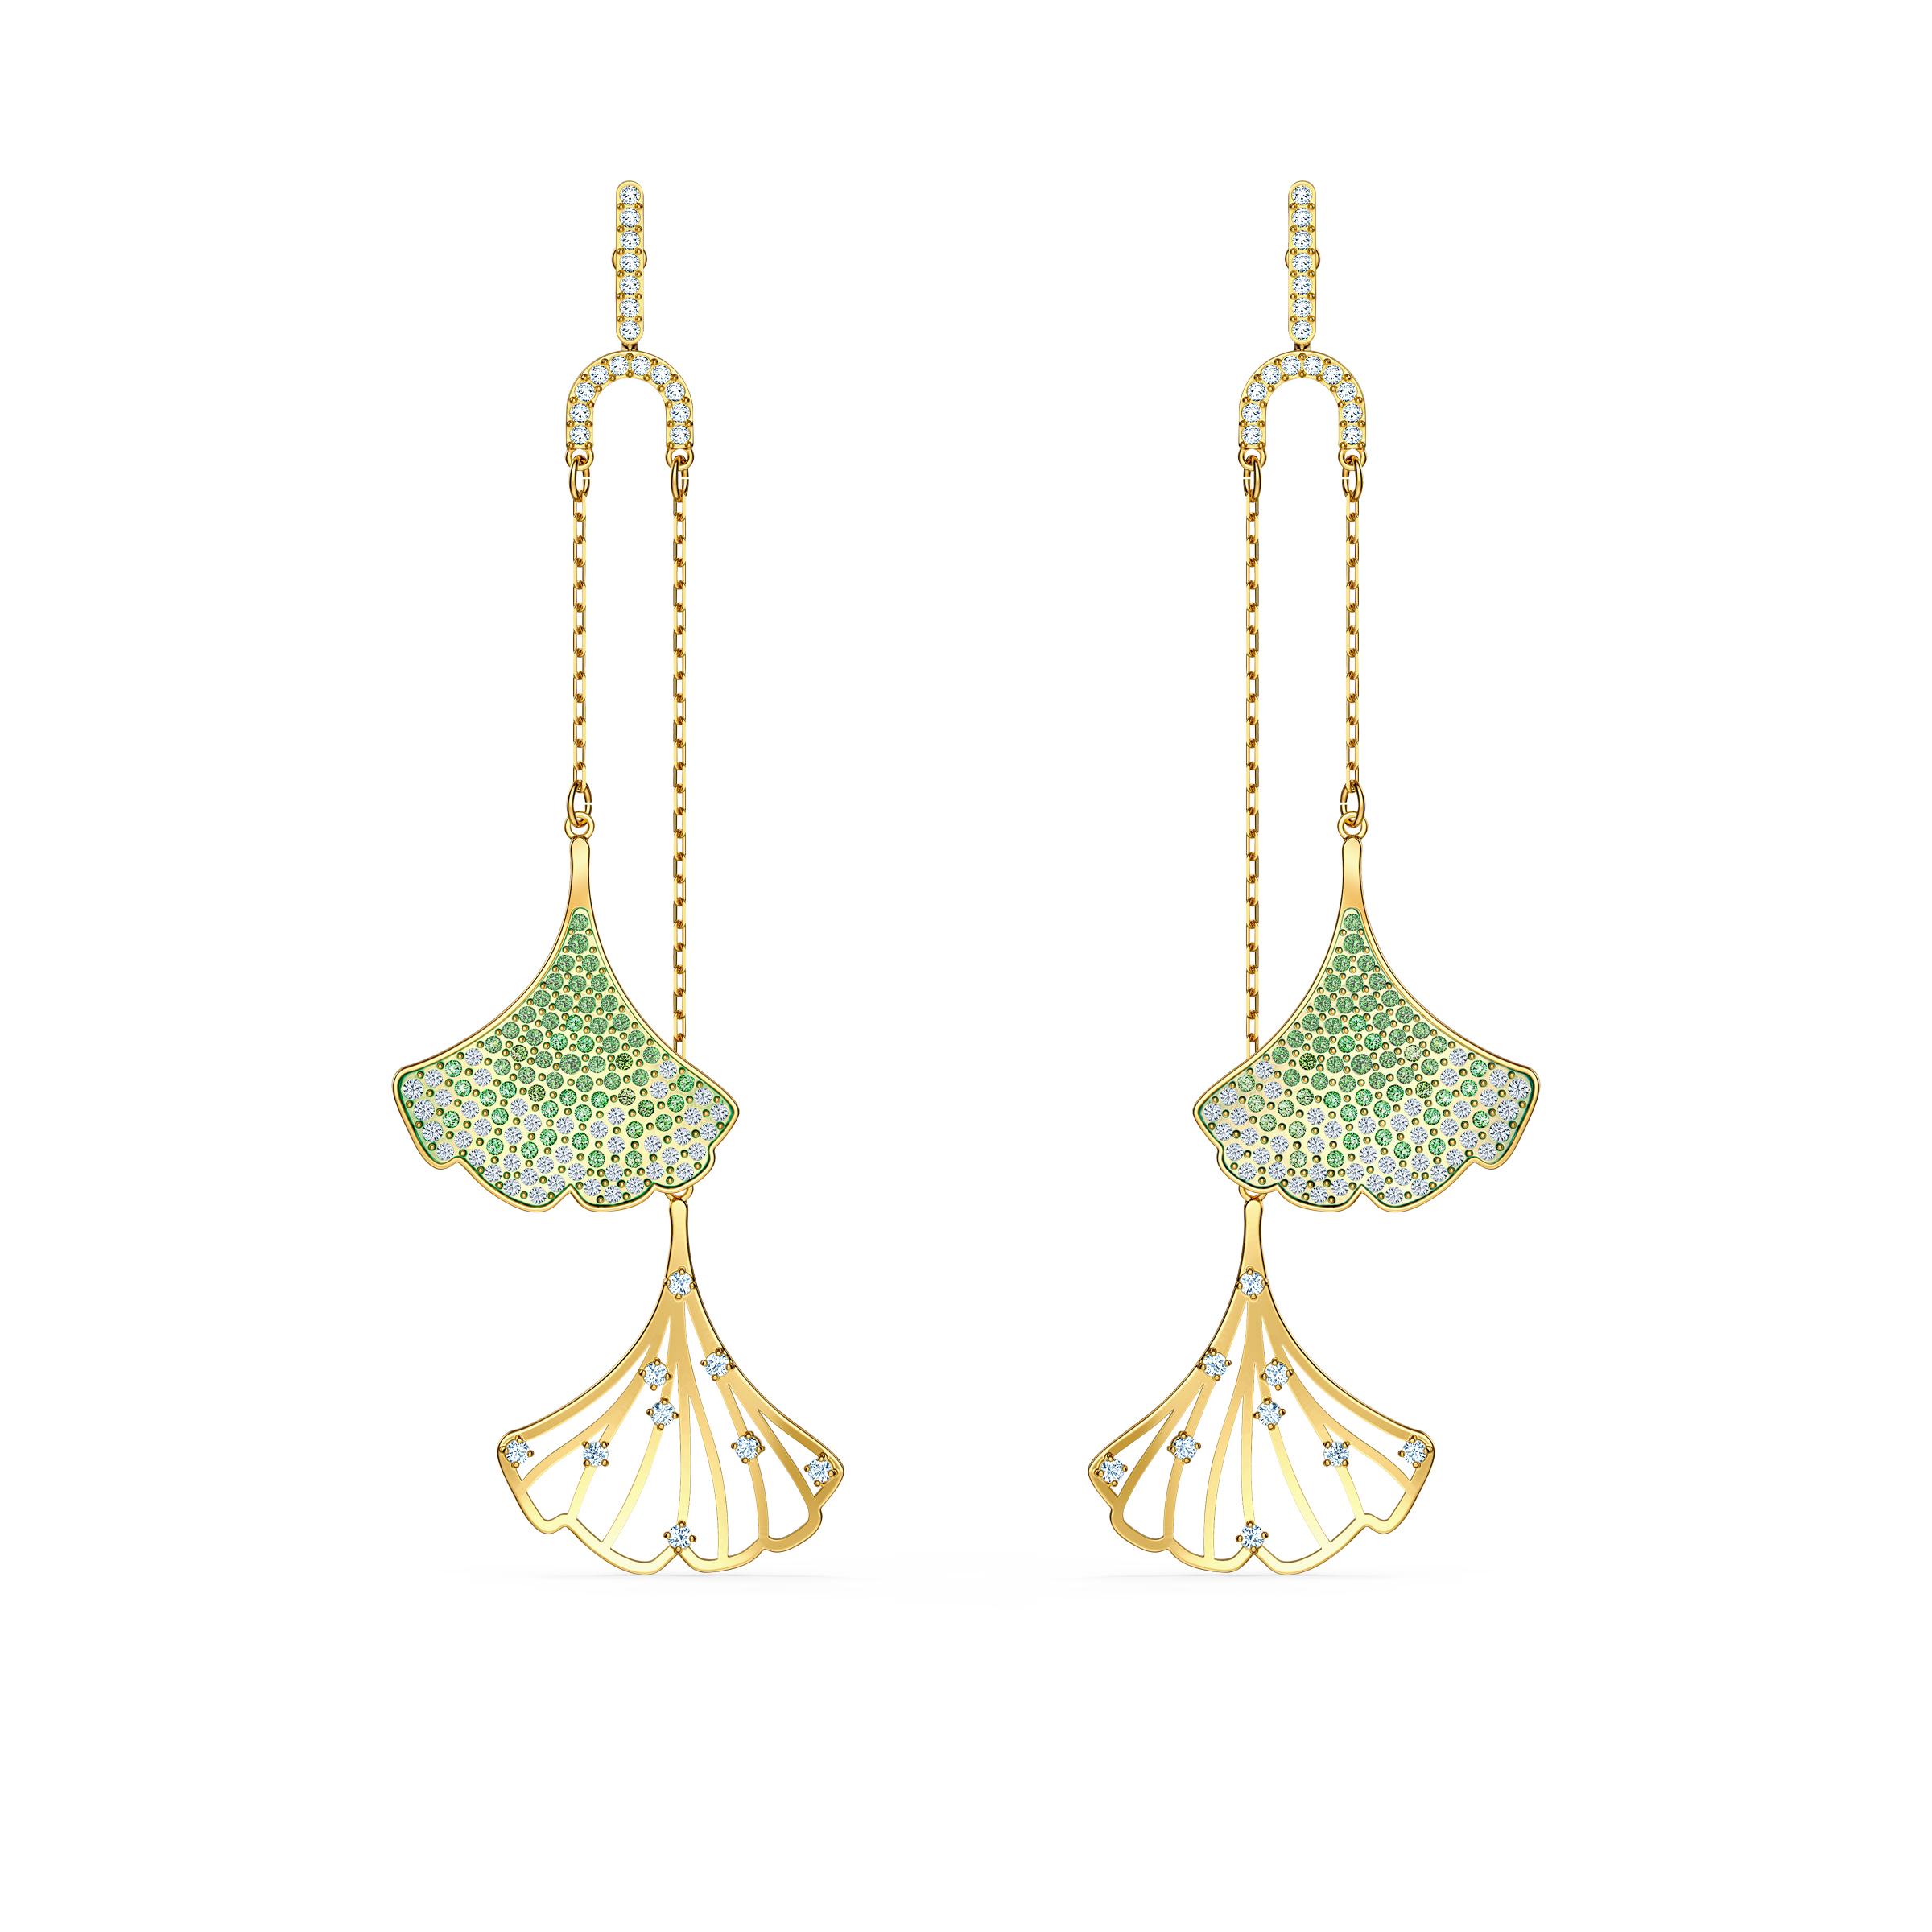 Boucles d'oreilles Stunning Ginko Mobile, vert, métal doré, Swarovski